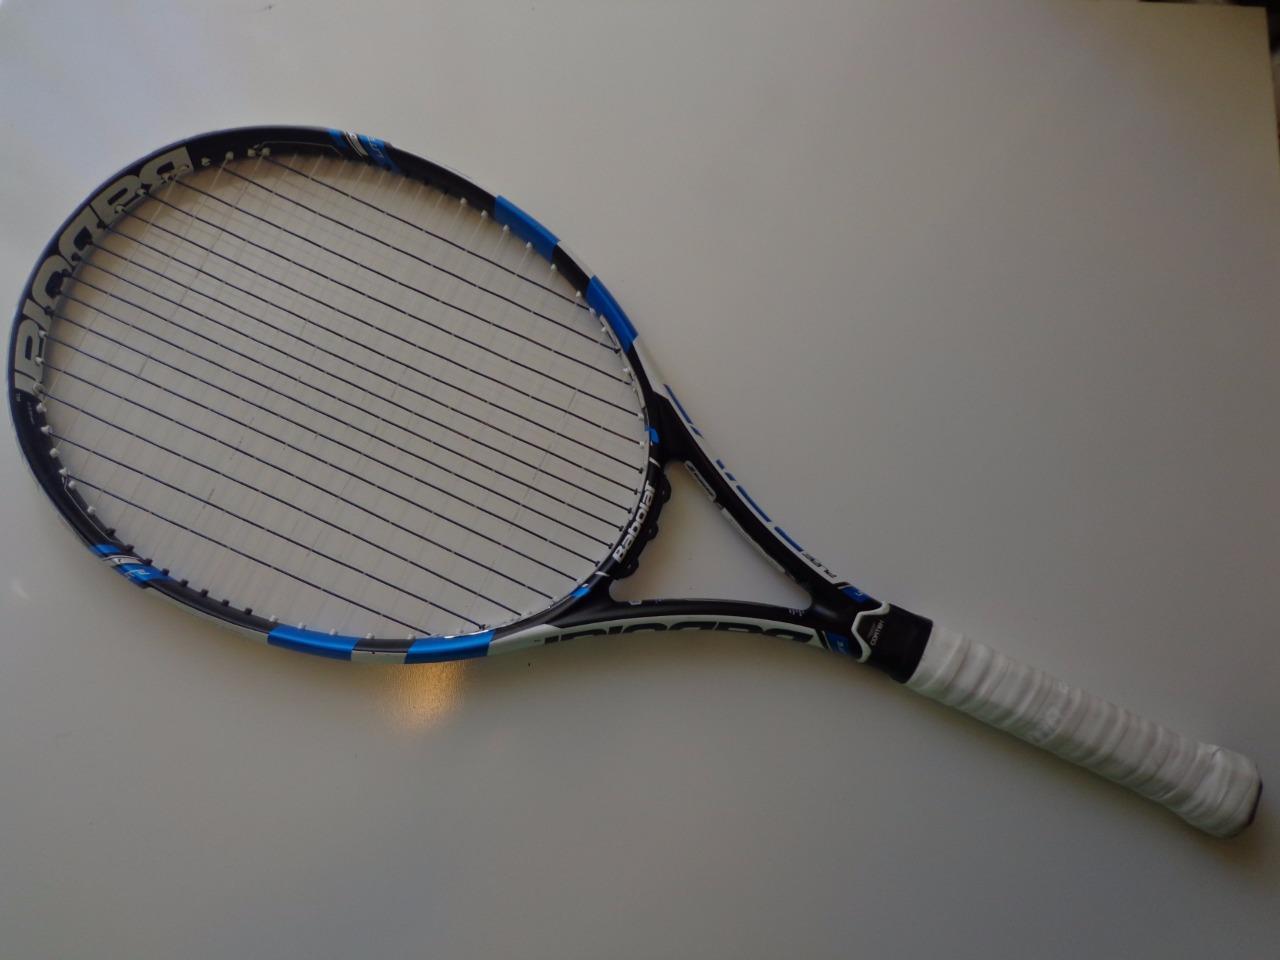 Babolat 2015 Pure Drive LITE 100 head 4 3 8 grip Tennis Racquet